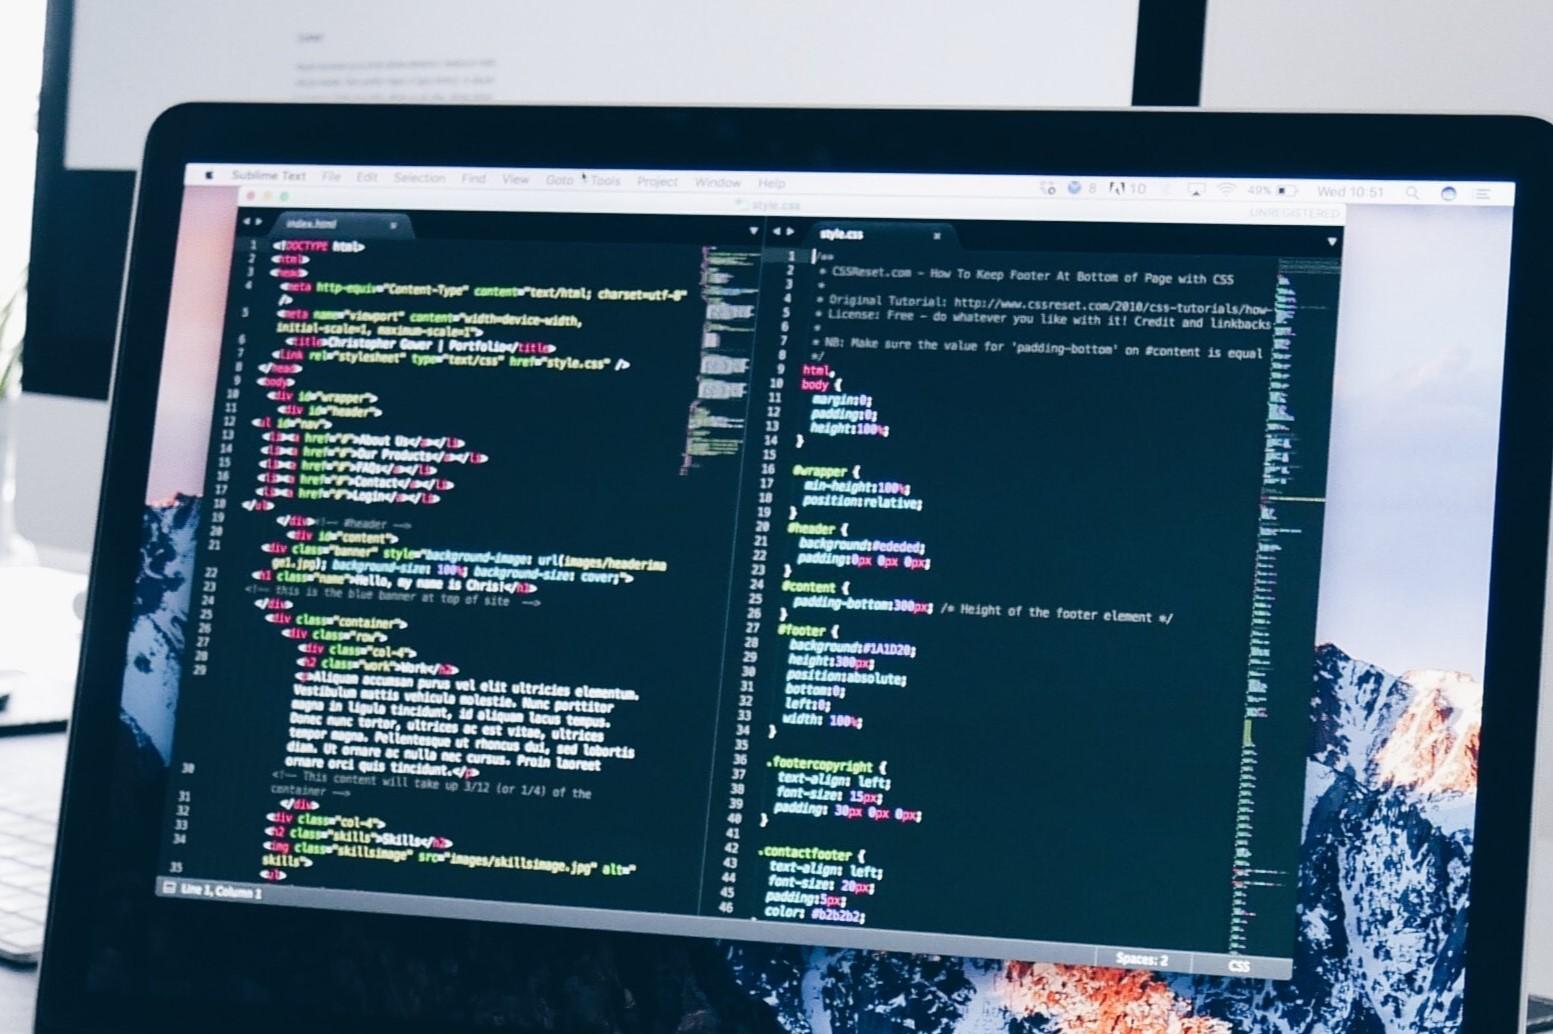 Hacking ético para proteger tu empresa